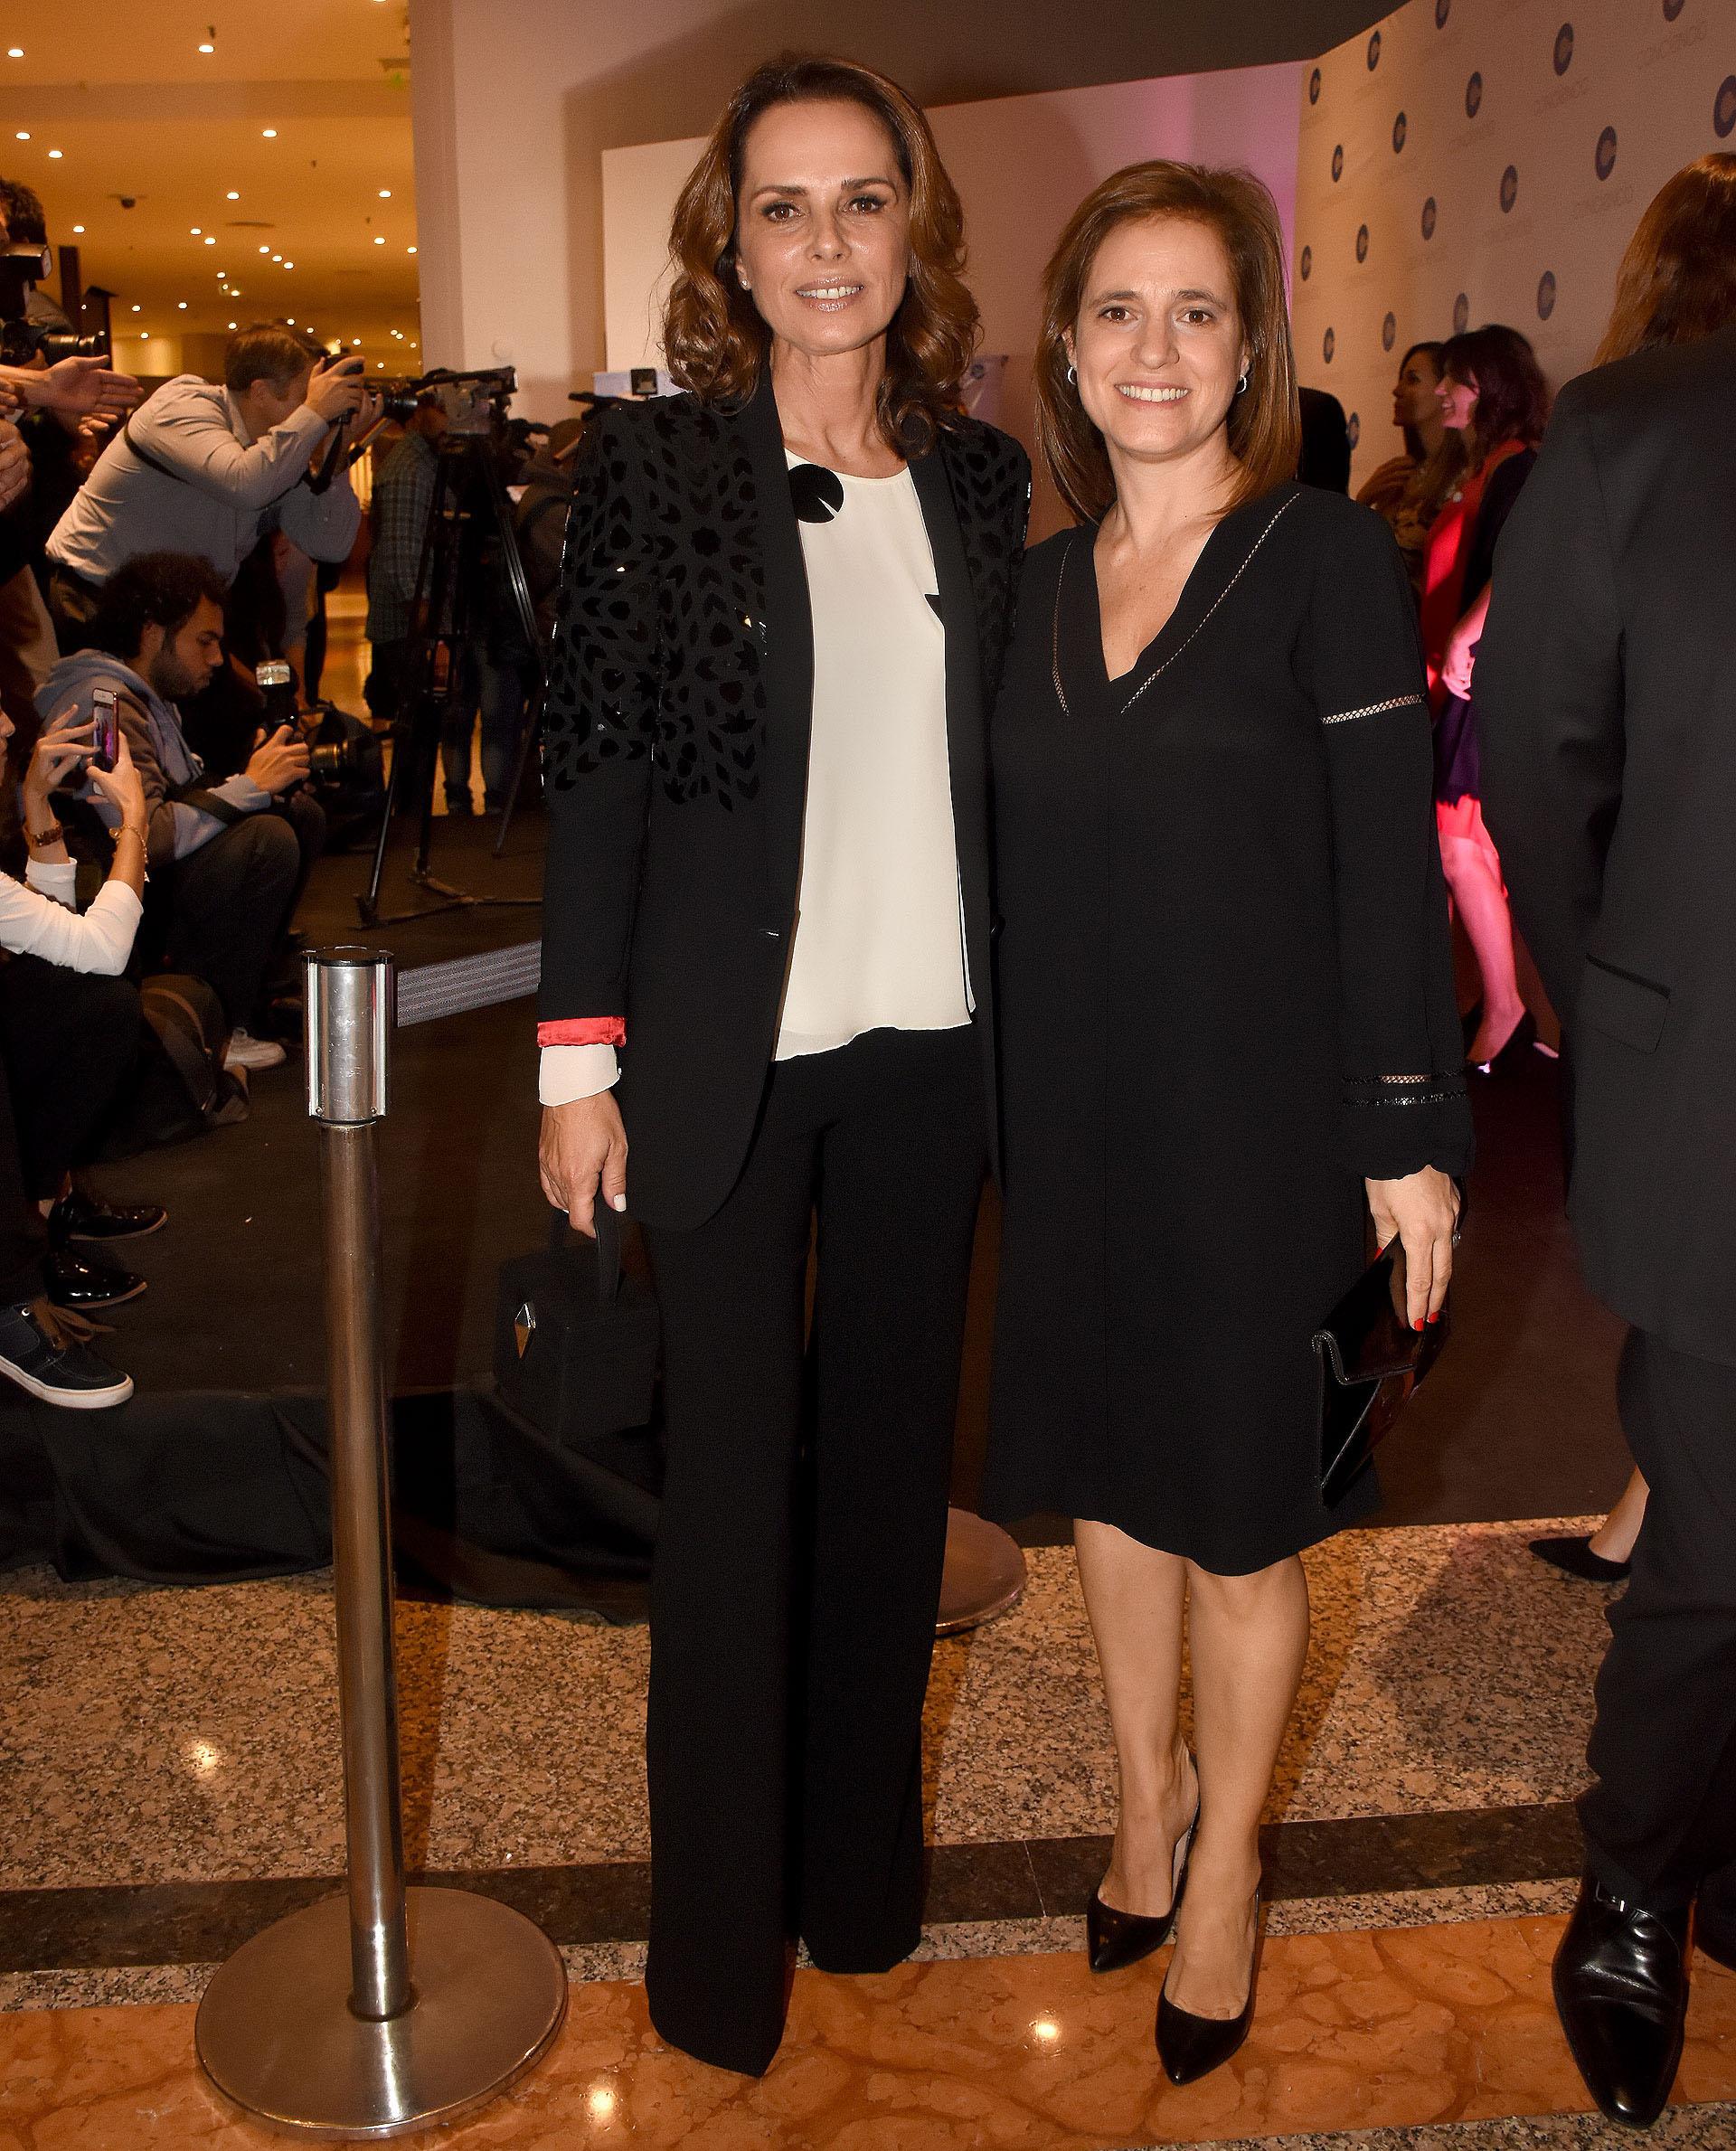 Nathalie Sielecki y Silvina Pueyrredon